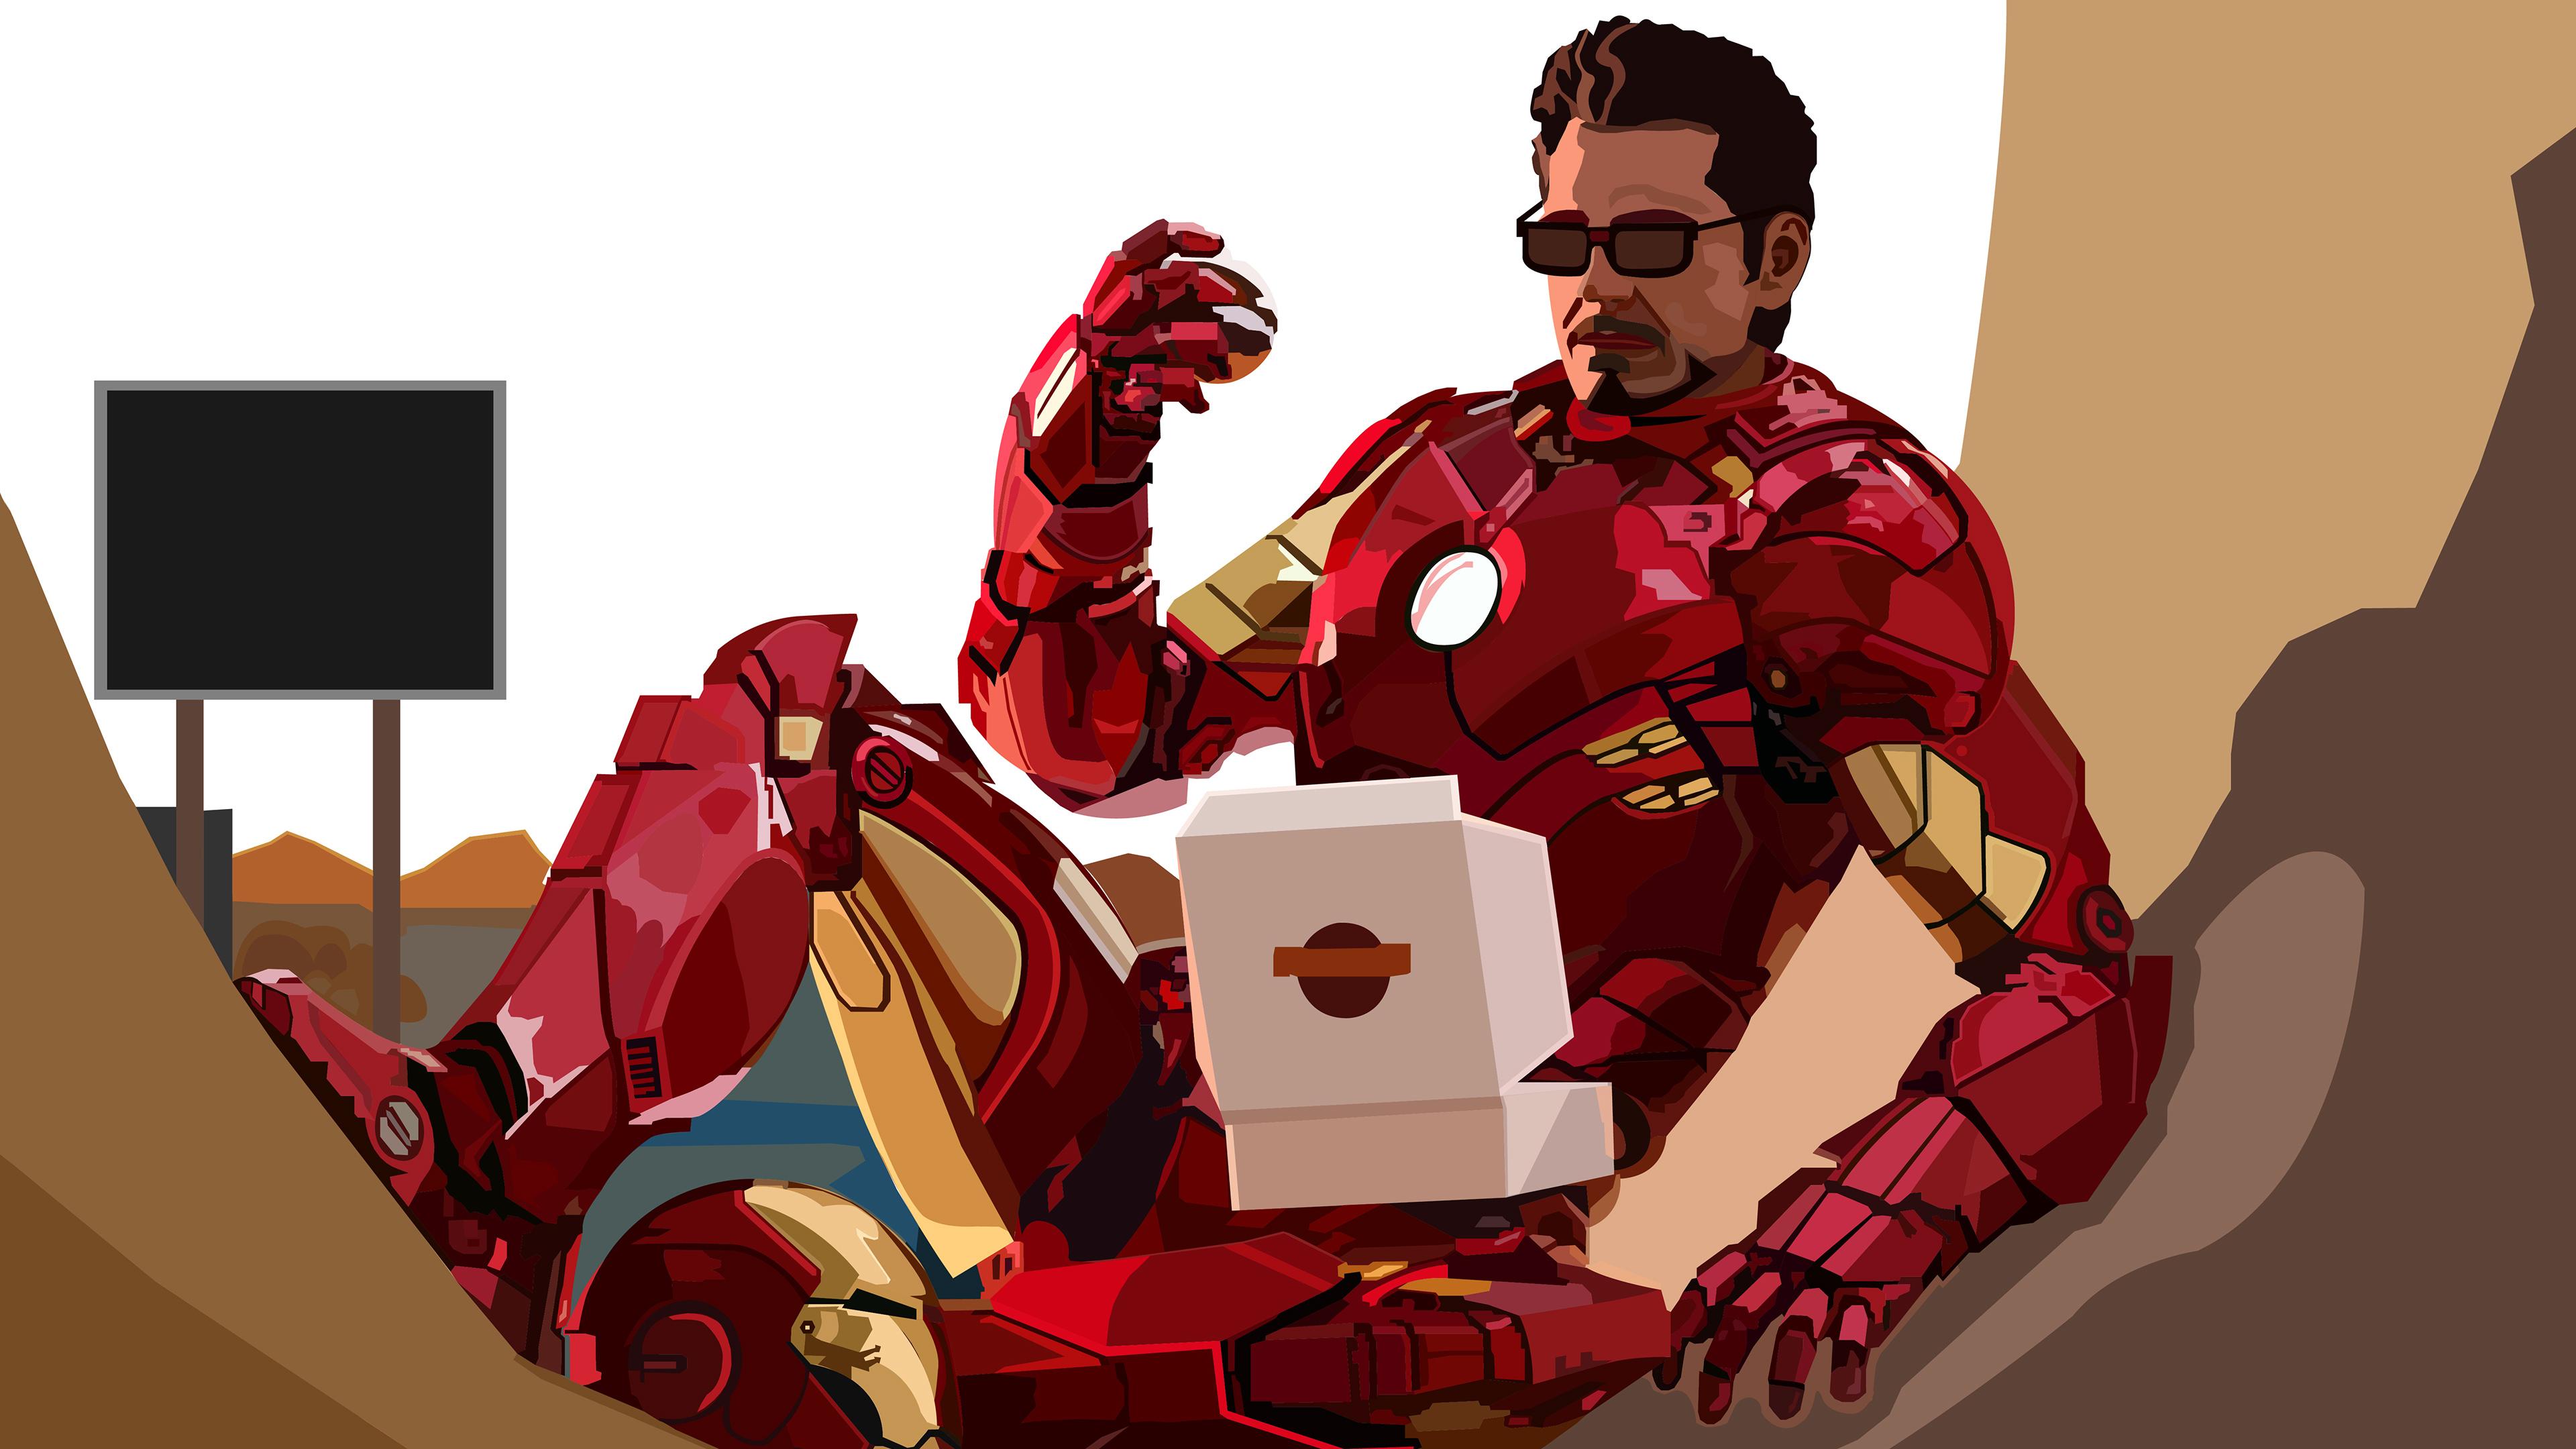 iron man eating donuts 2020 4k 1604347917 - Iron Man Eating Donuts 2020 4k - Iron Man Eating Donuts 2020 4k wallpapers